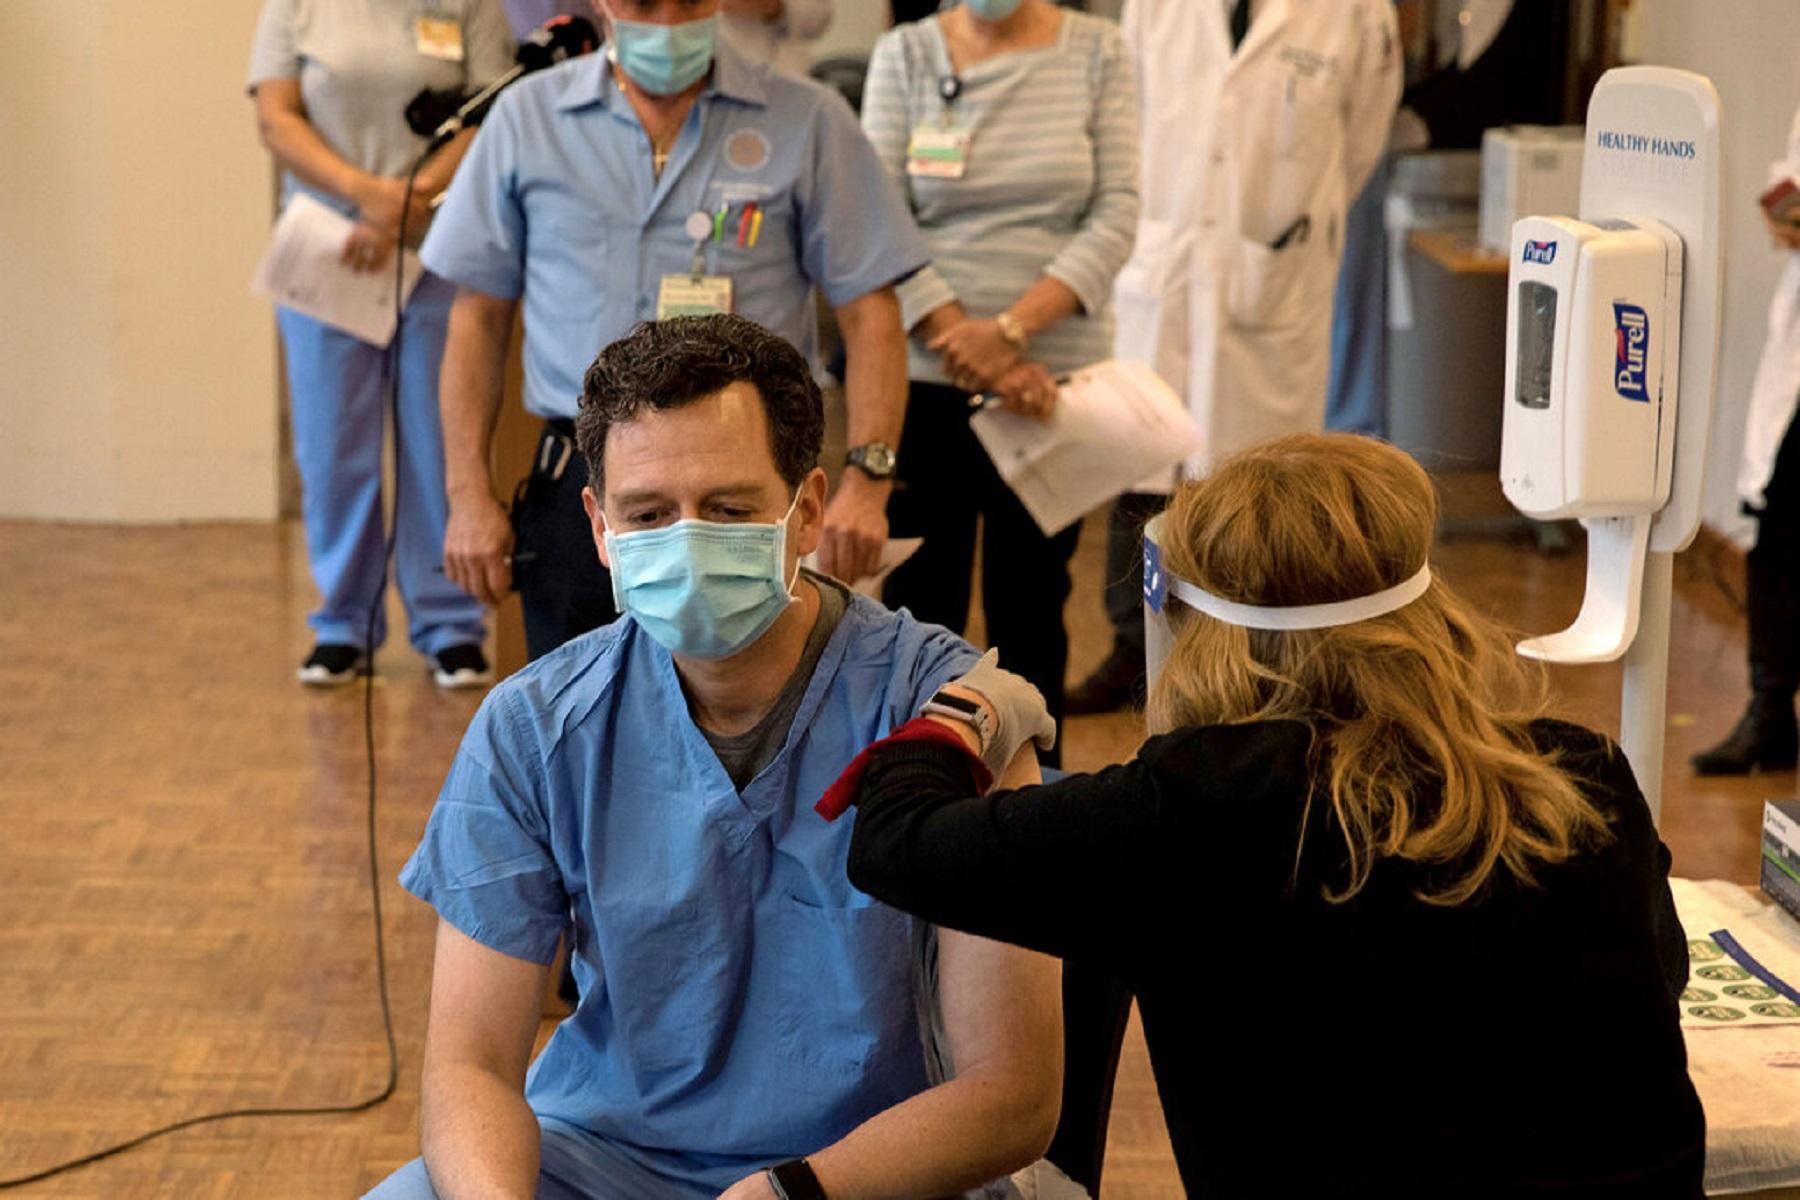 New Jersey: Αντίδραση αντιμετωπίζει το νοσοκομειακό σύστημα που απειλεί να απολύσει το μη εμβολιασμένο προσωπικό